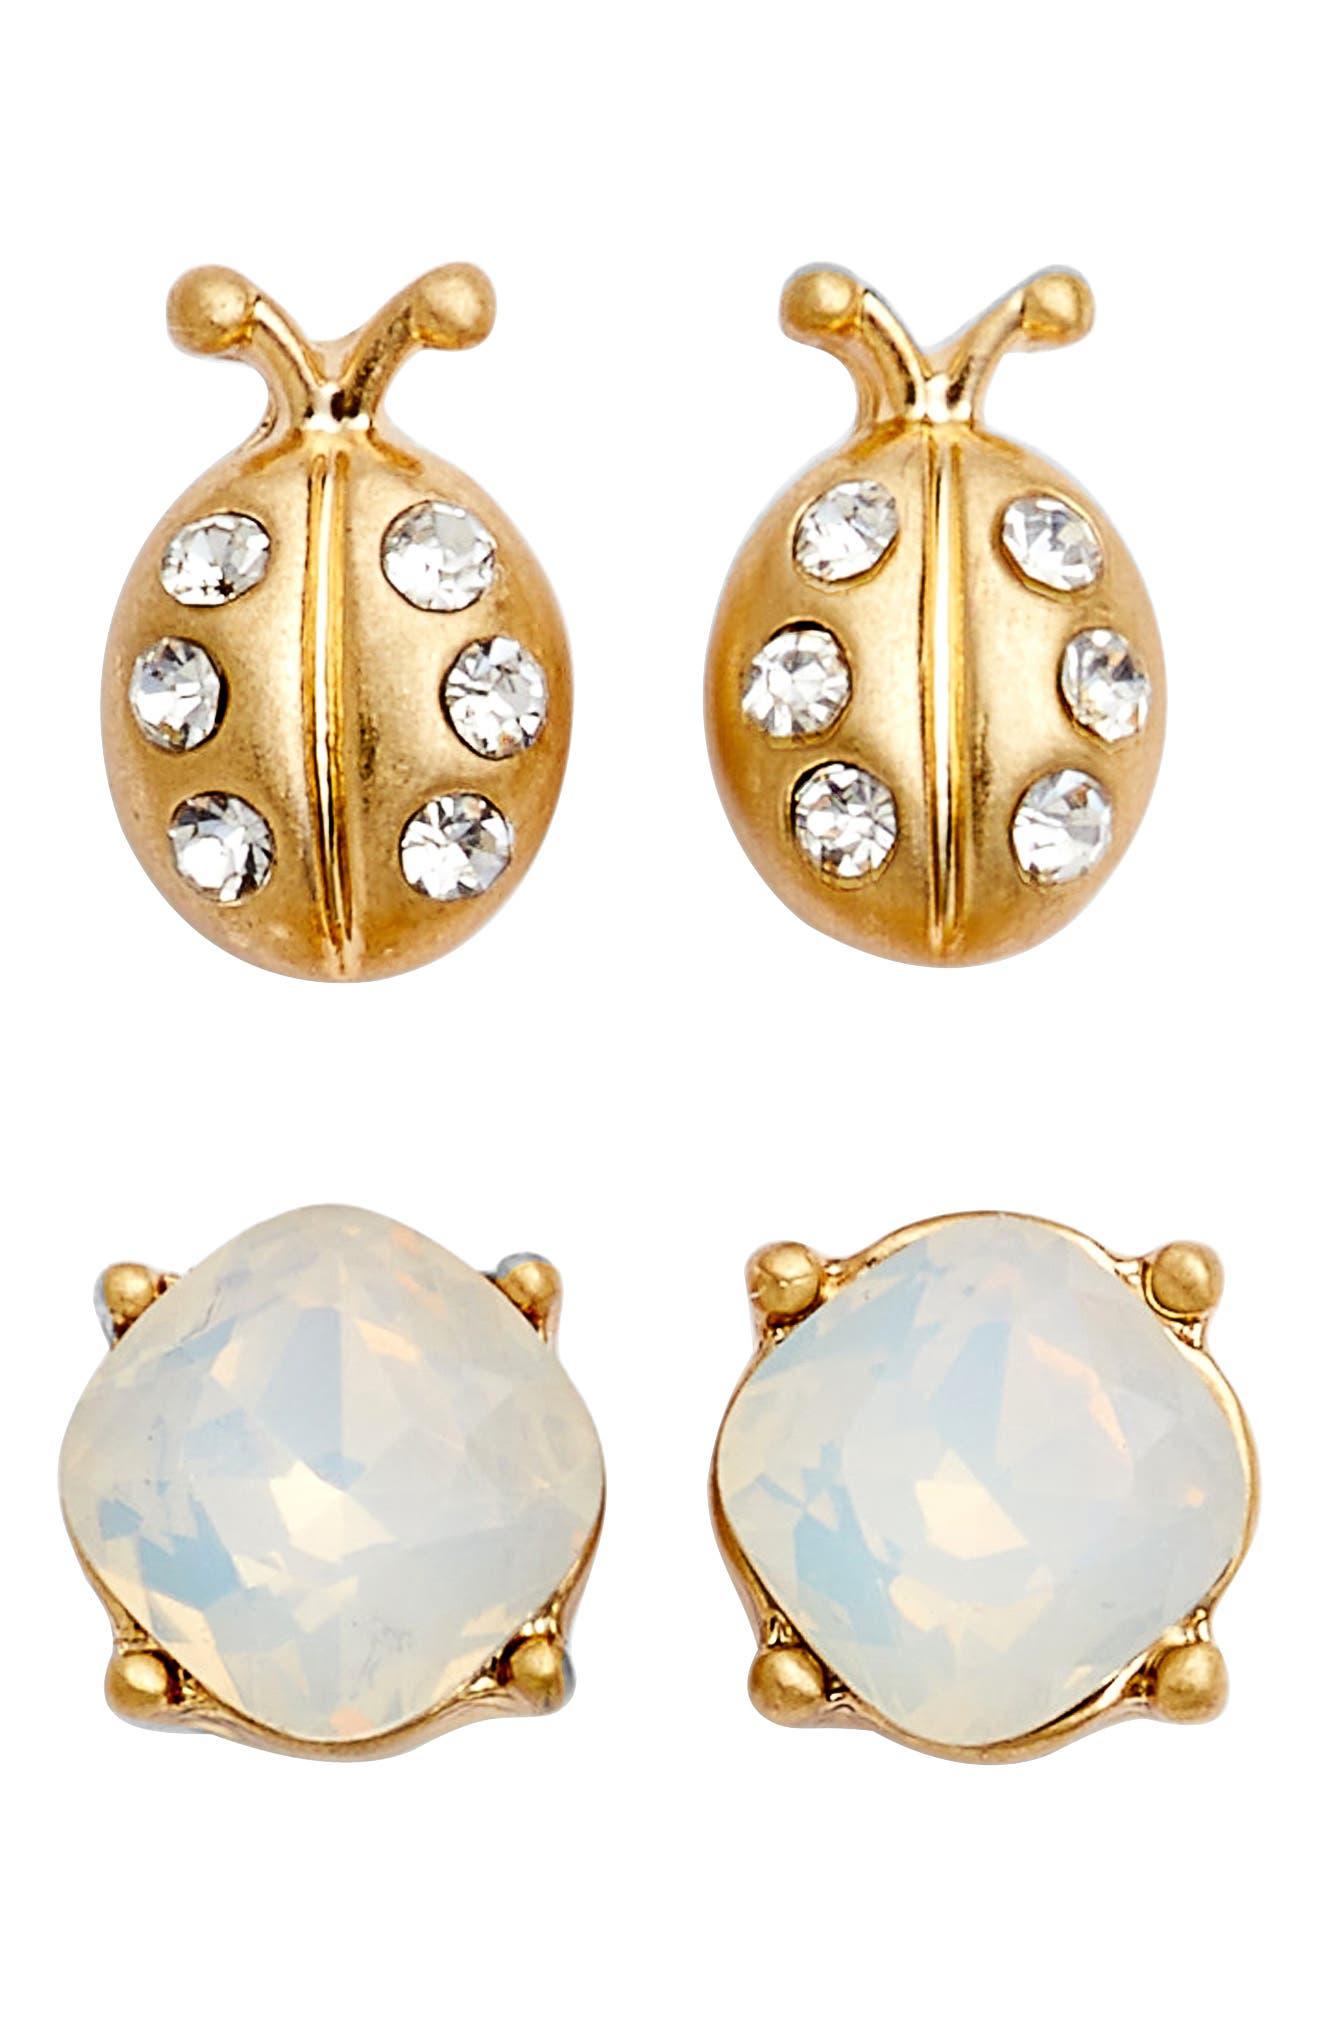 Set of 2 Jeweled Ladybug Earrings,                         Main,                         color,